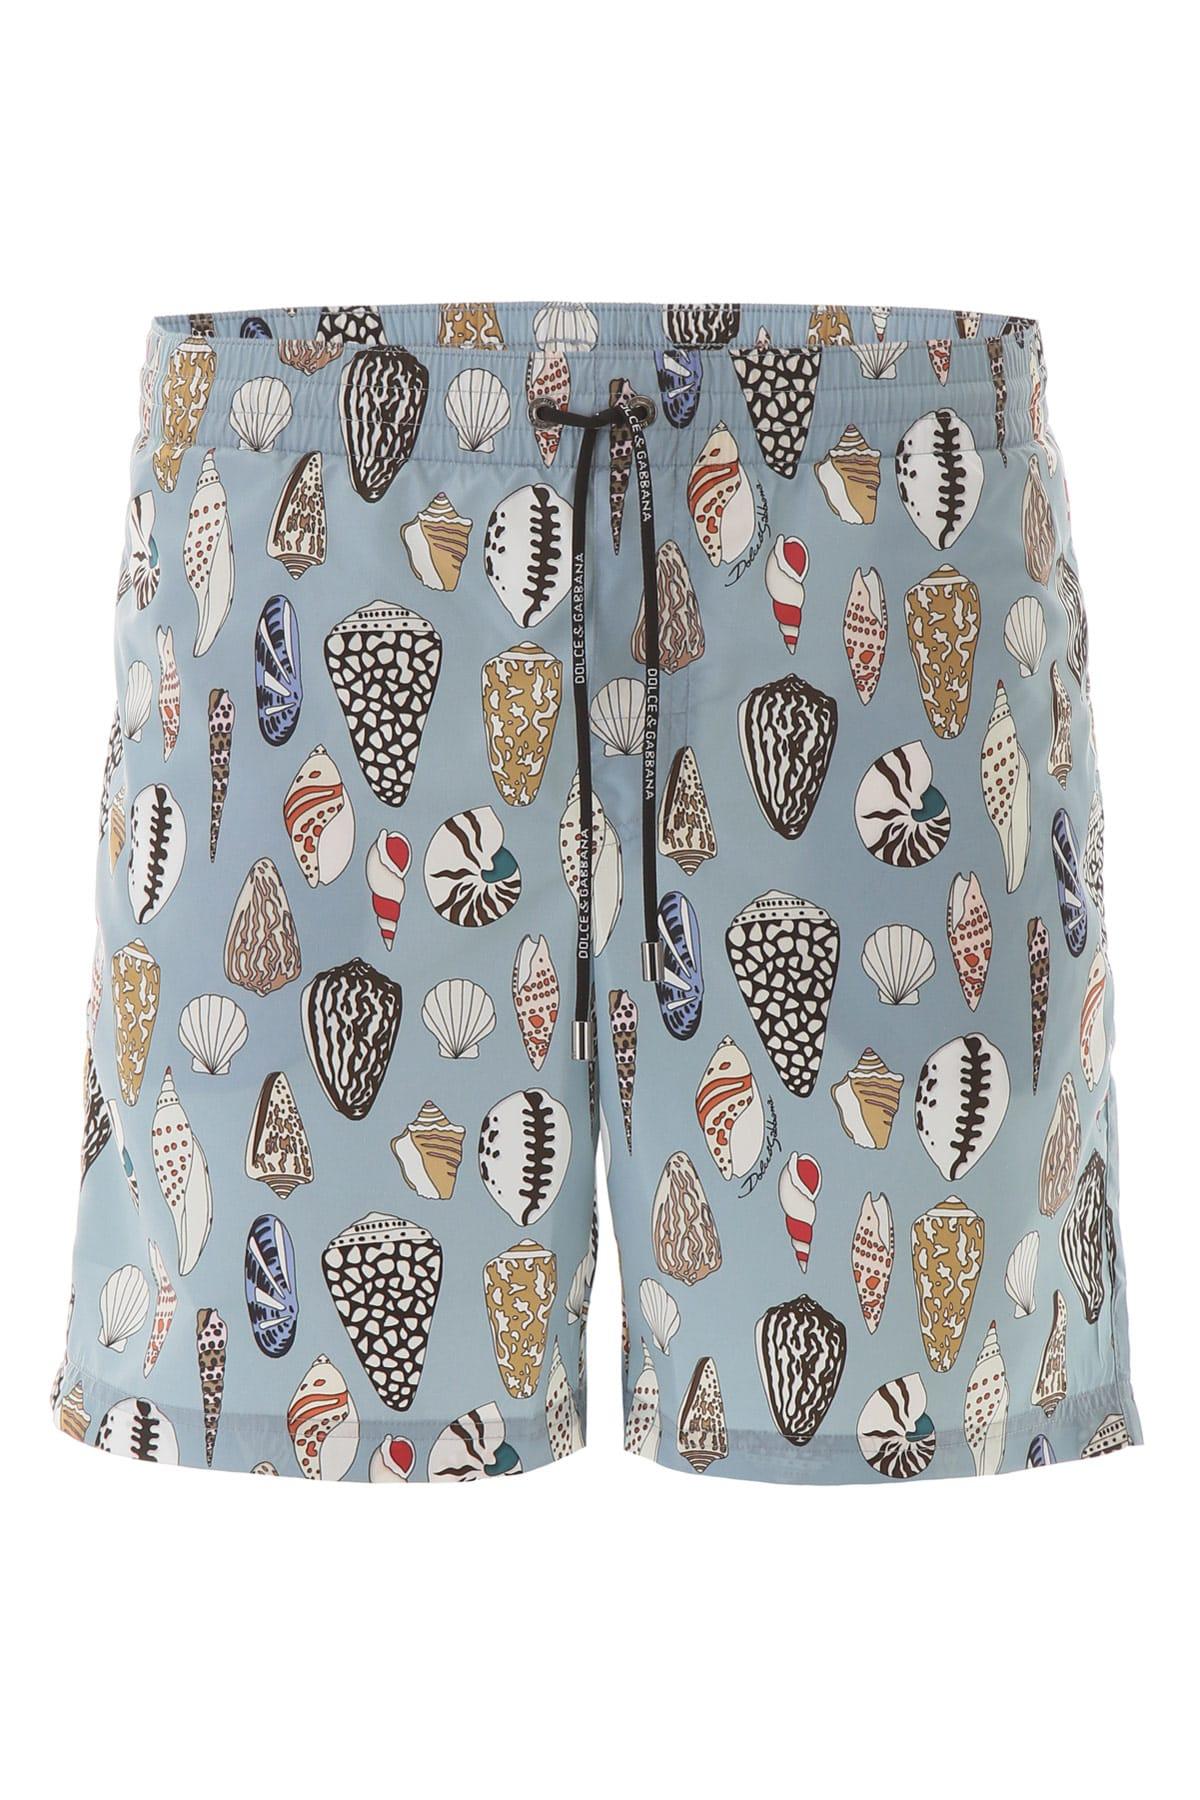 Dolce & Gabbana Shell Print Swim Trunks